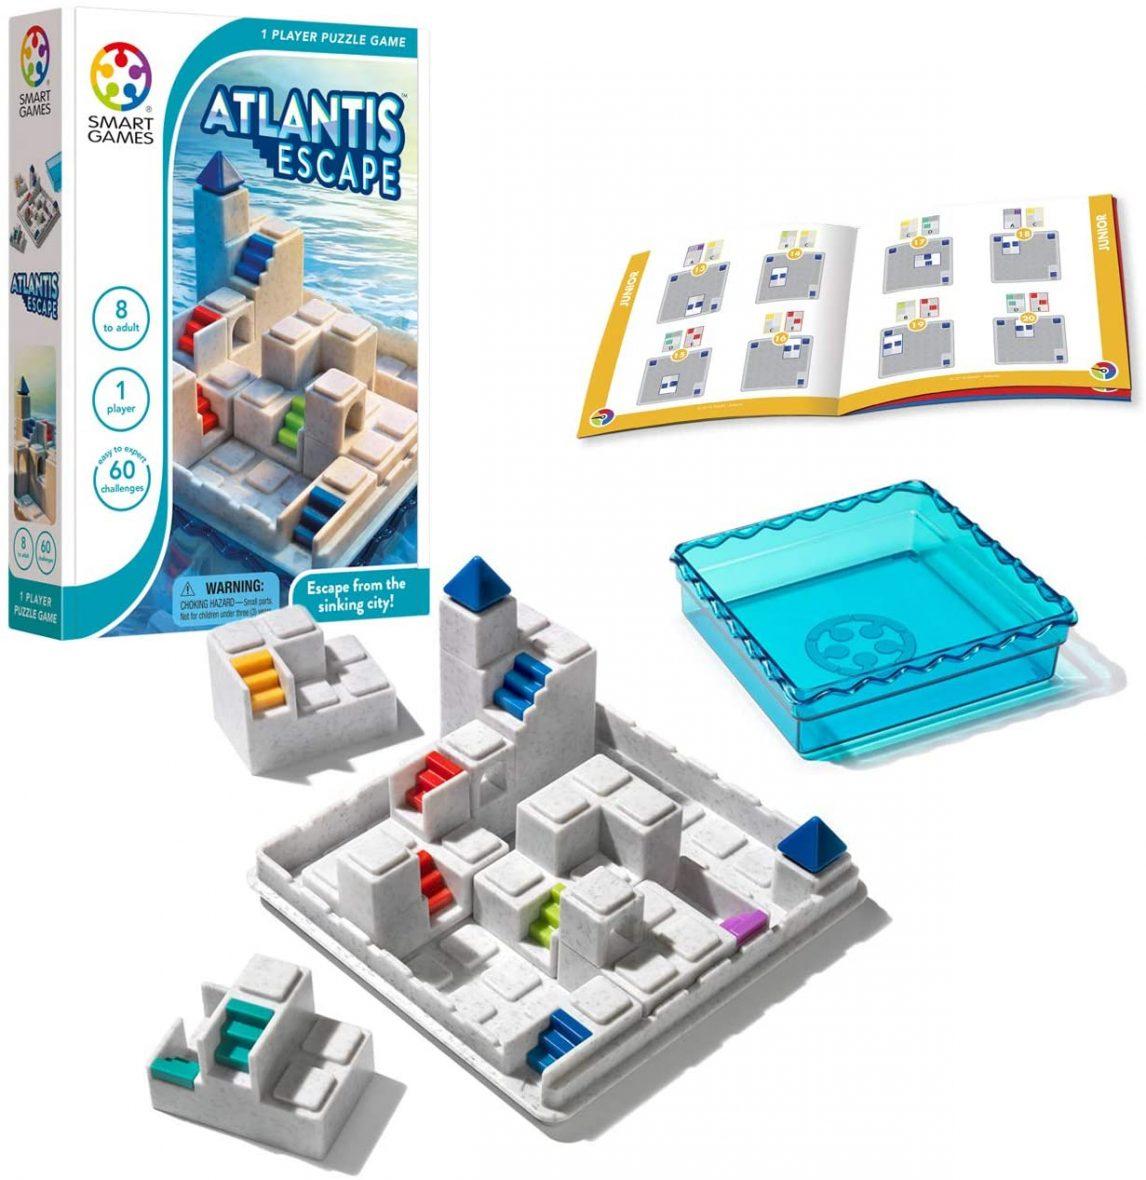 Smartgames atlantis